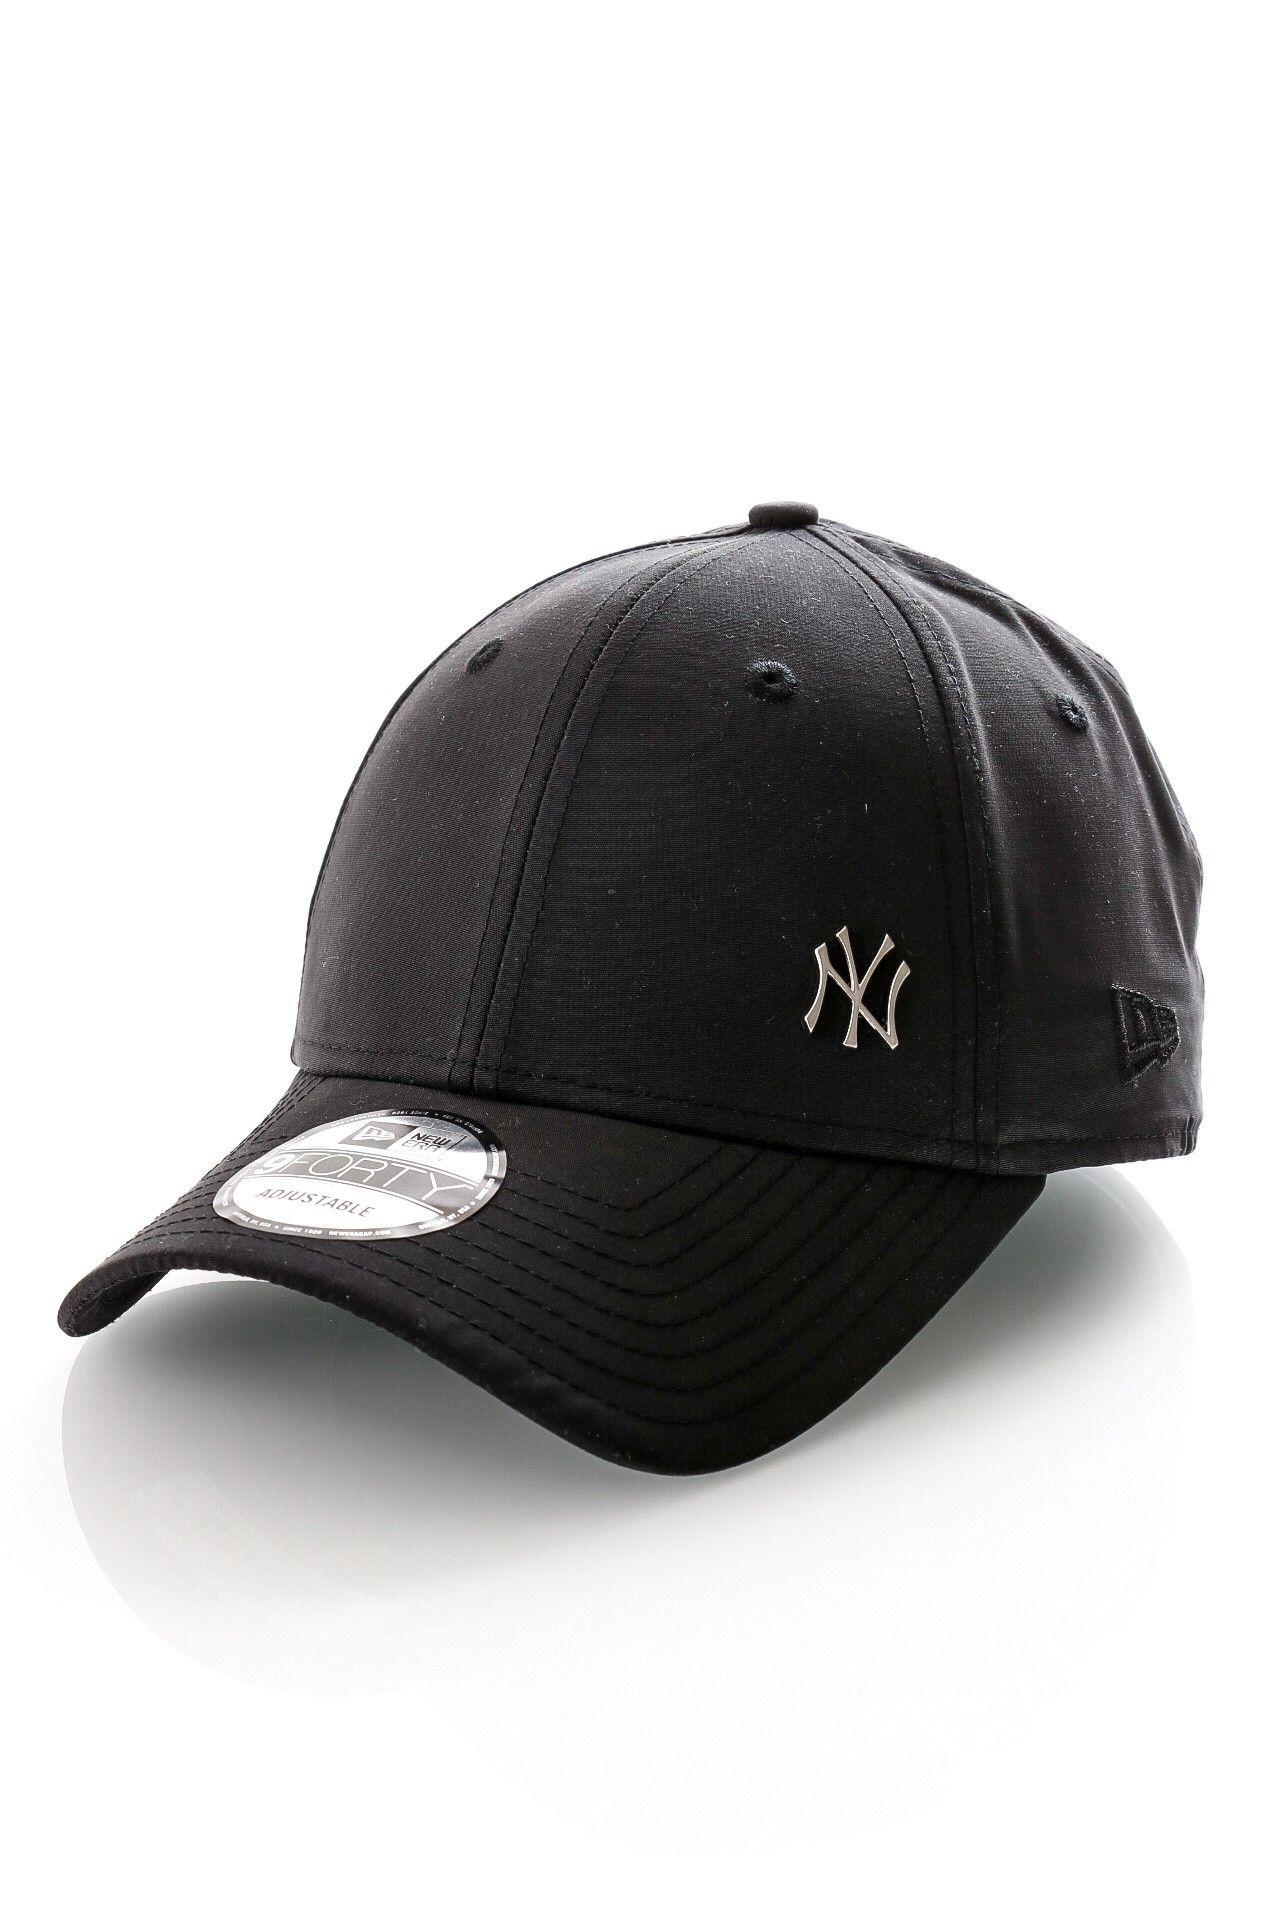 Afbeelding van New Era Dad Cap New York Yankees MLB flawless 940 NY Yankees 11198850